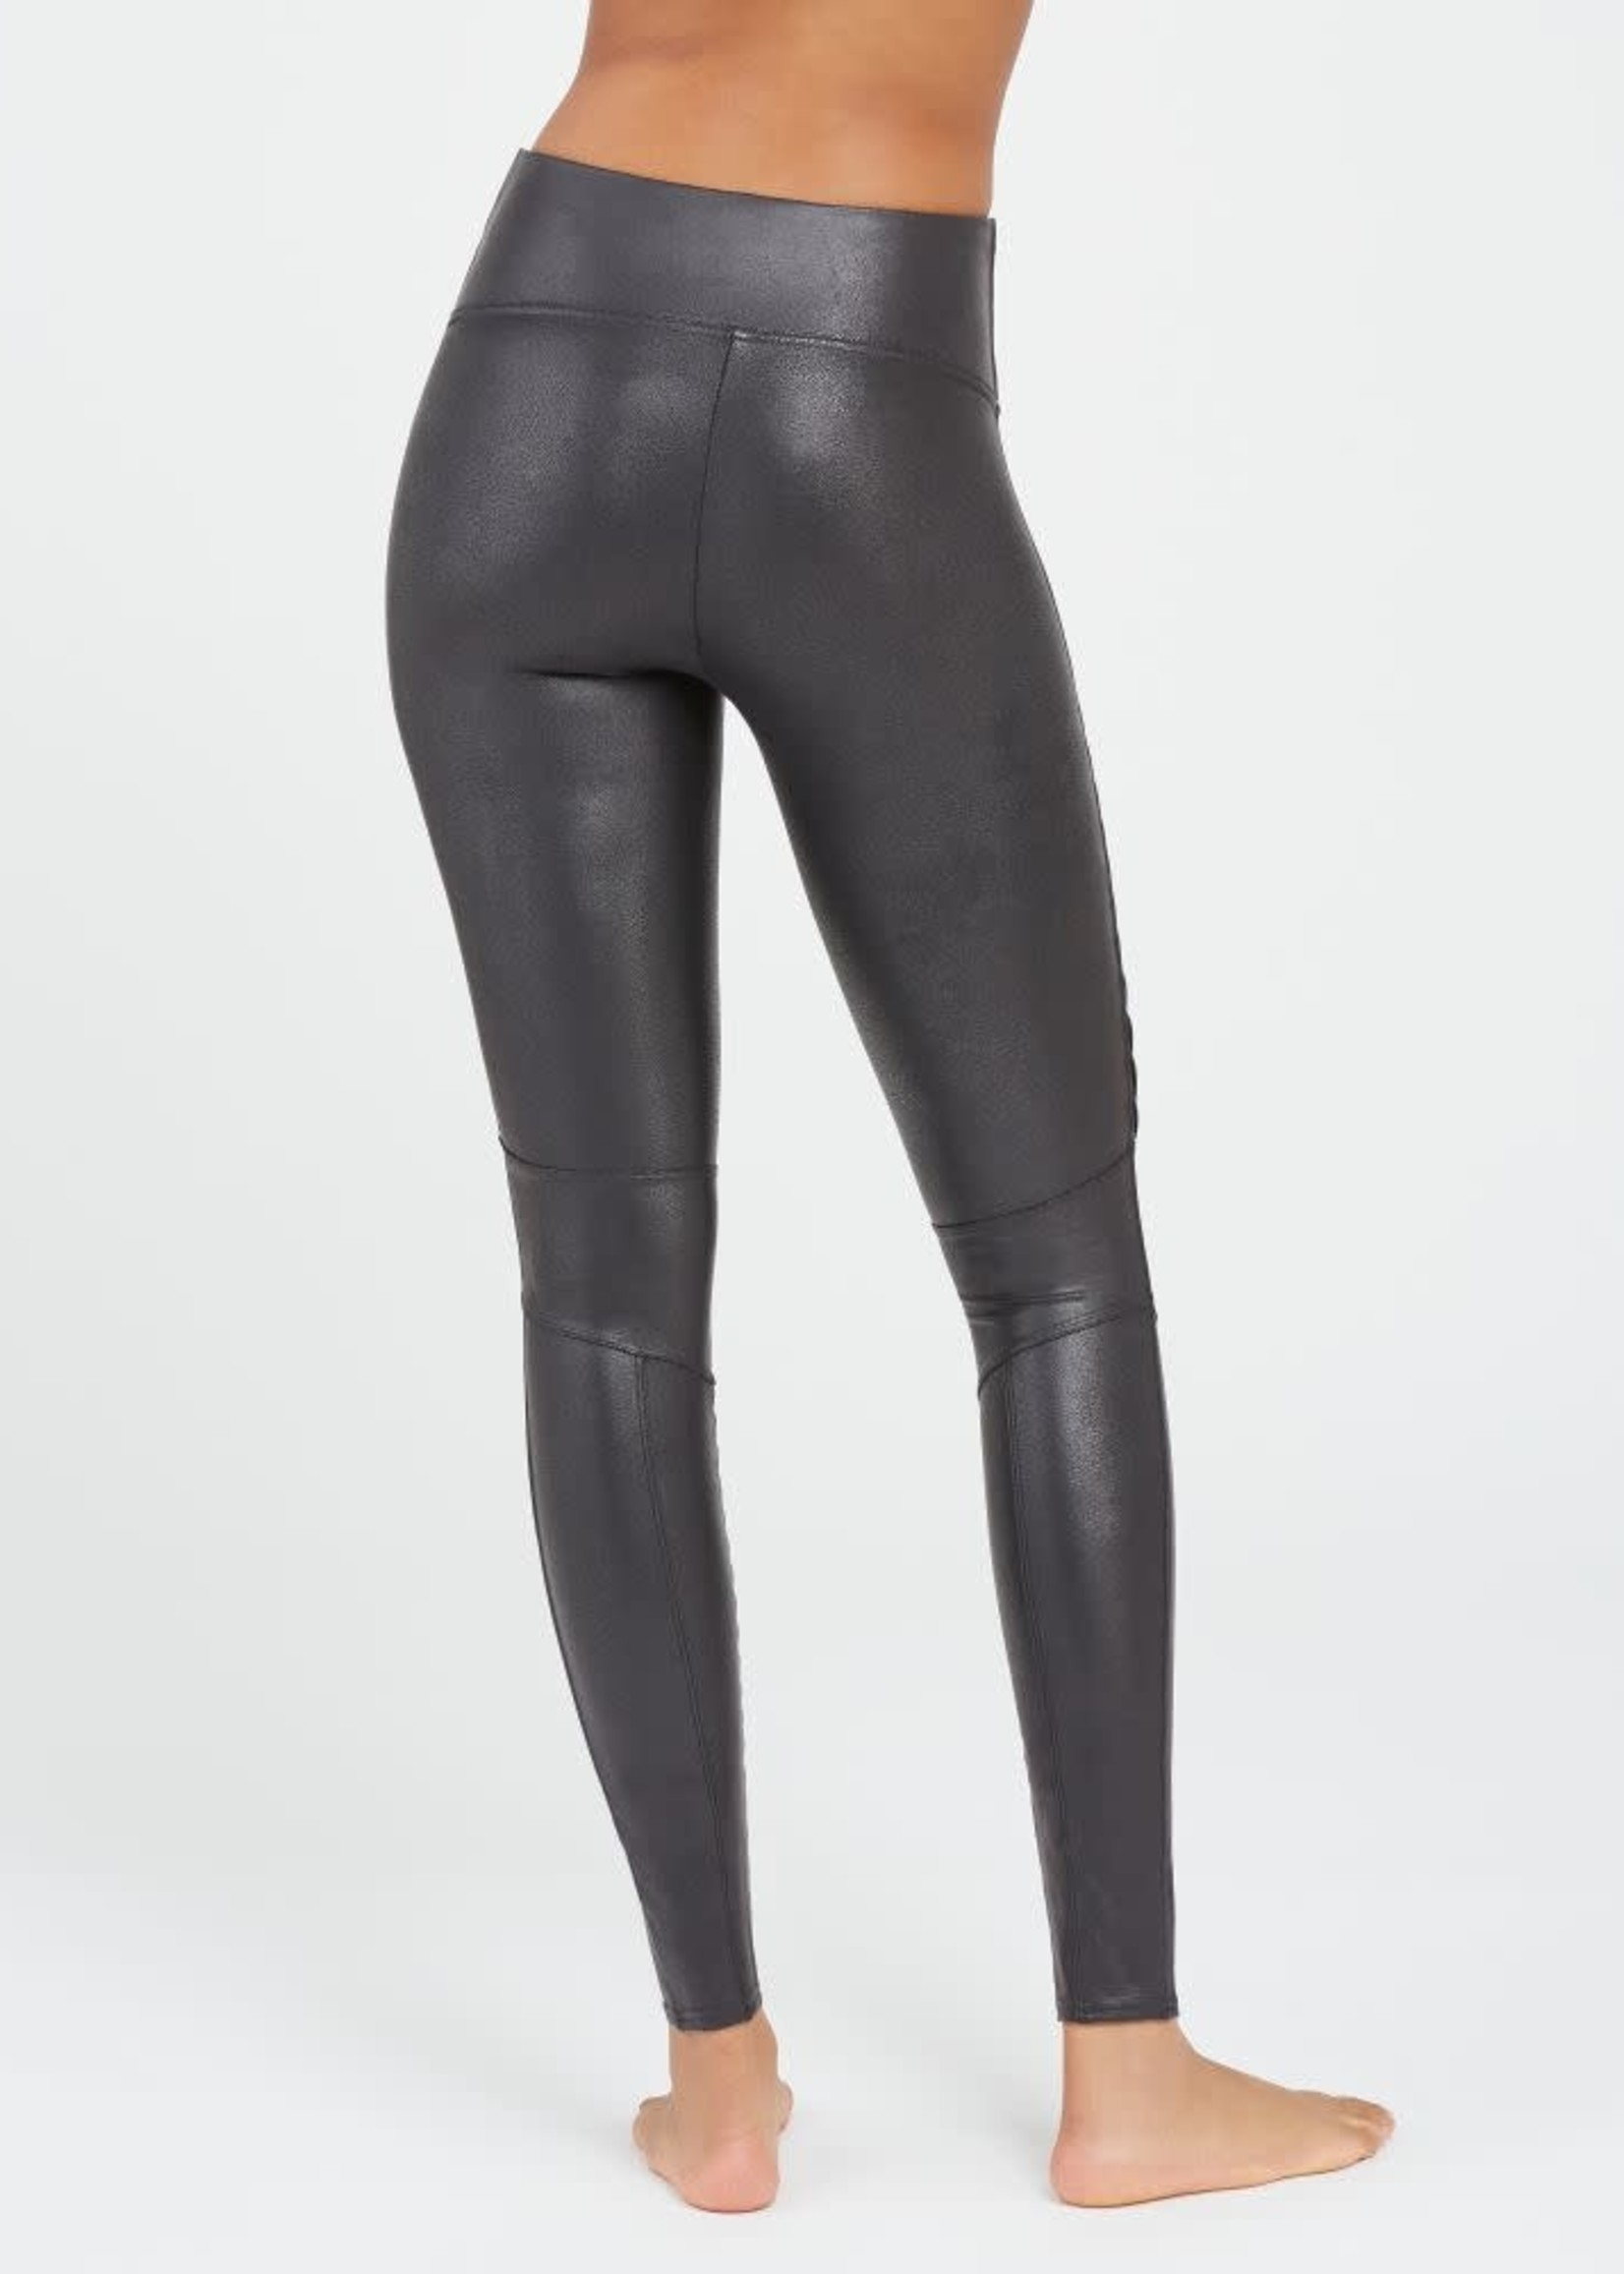 Spanx Faux Leather Moto Legging